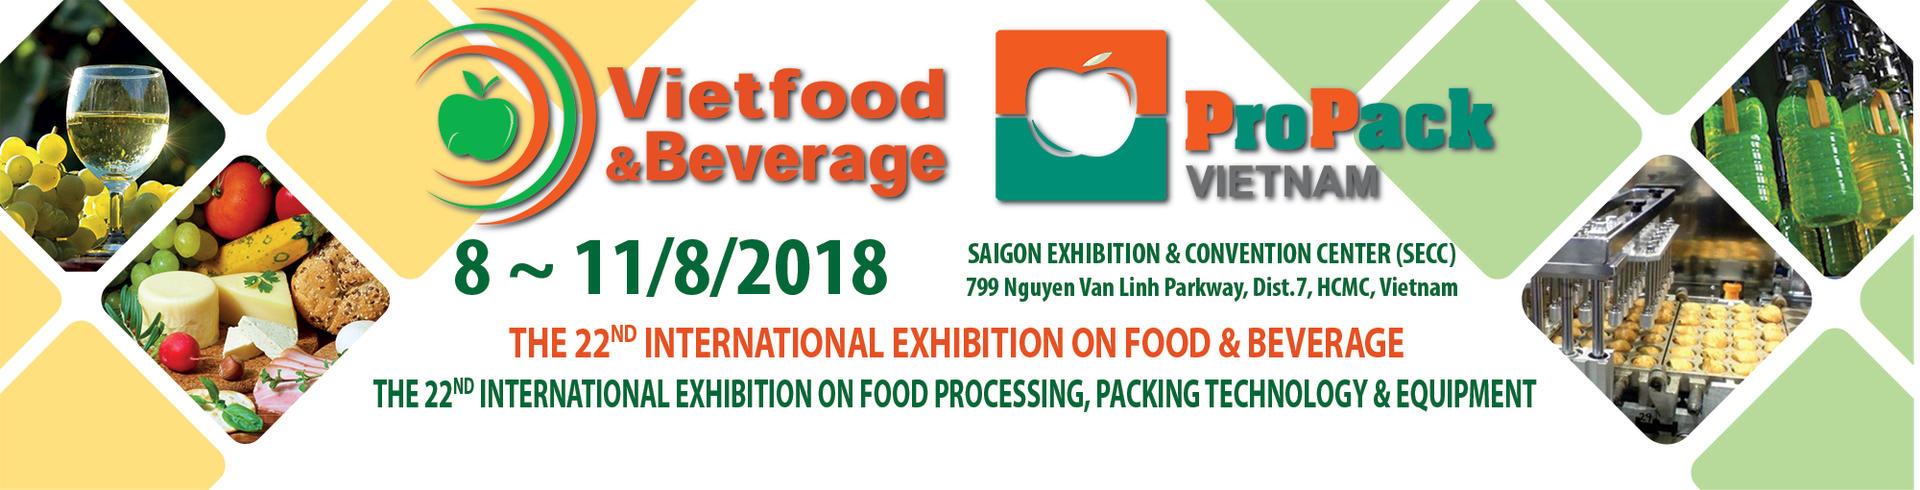 Vietfood & Beverage - ProPack Vietnam on 8th to 11th August